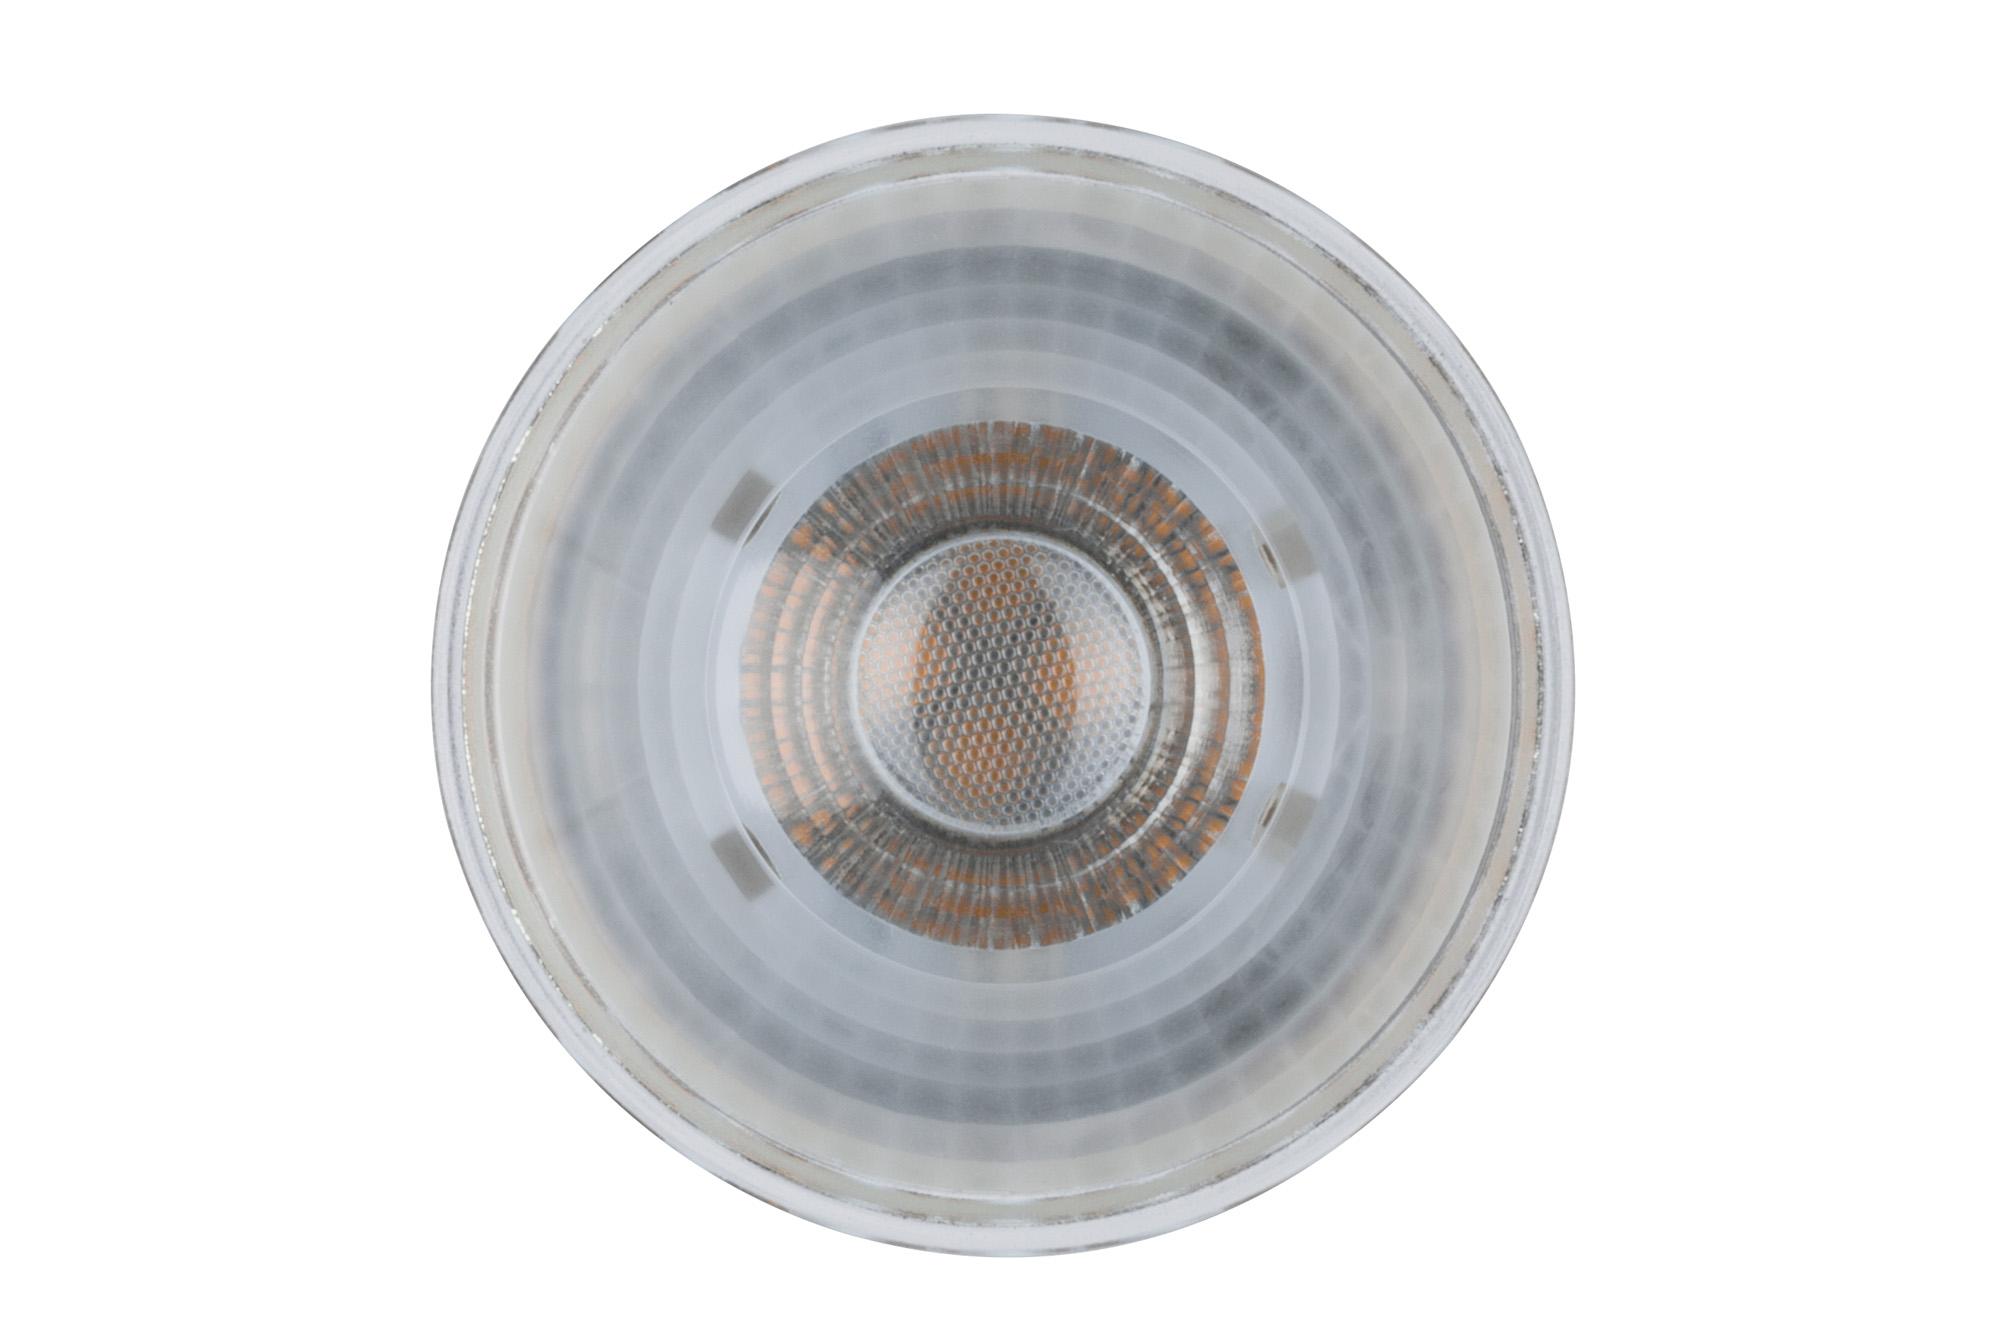 led glasreflektorlampe 5 7w gu10 warmwei dimmbar 28434. Black Bedroom Furniture Sets. Home Design Ideas